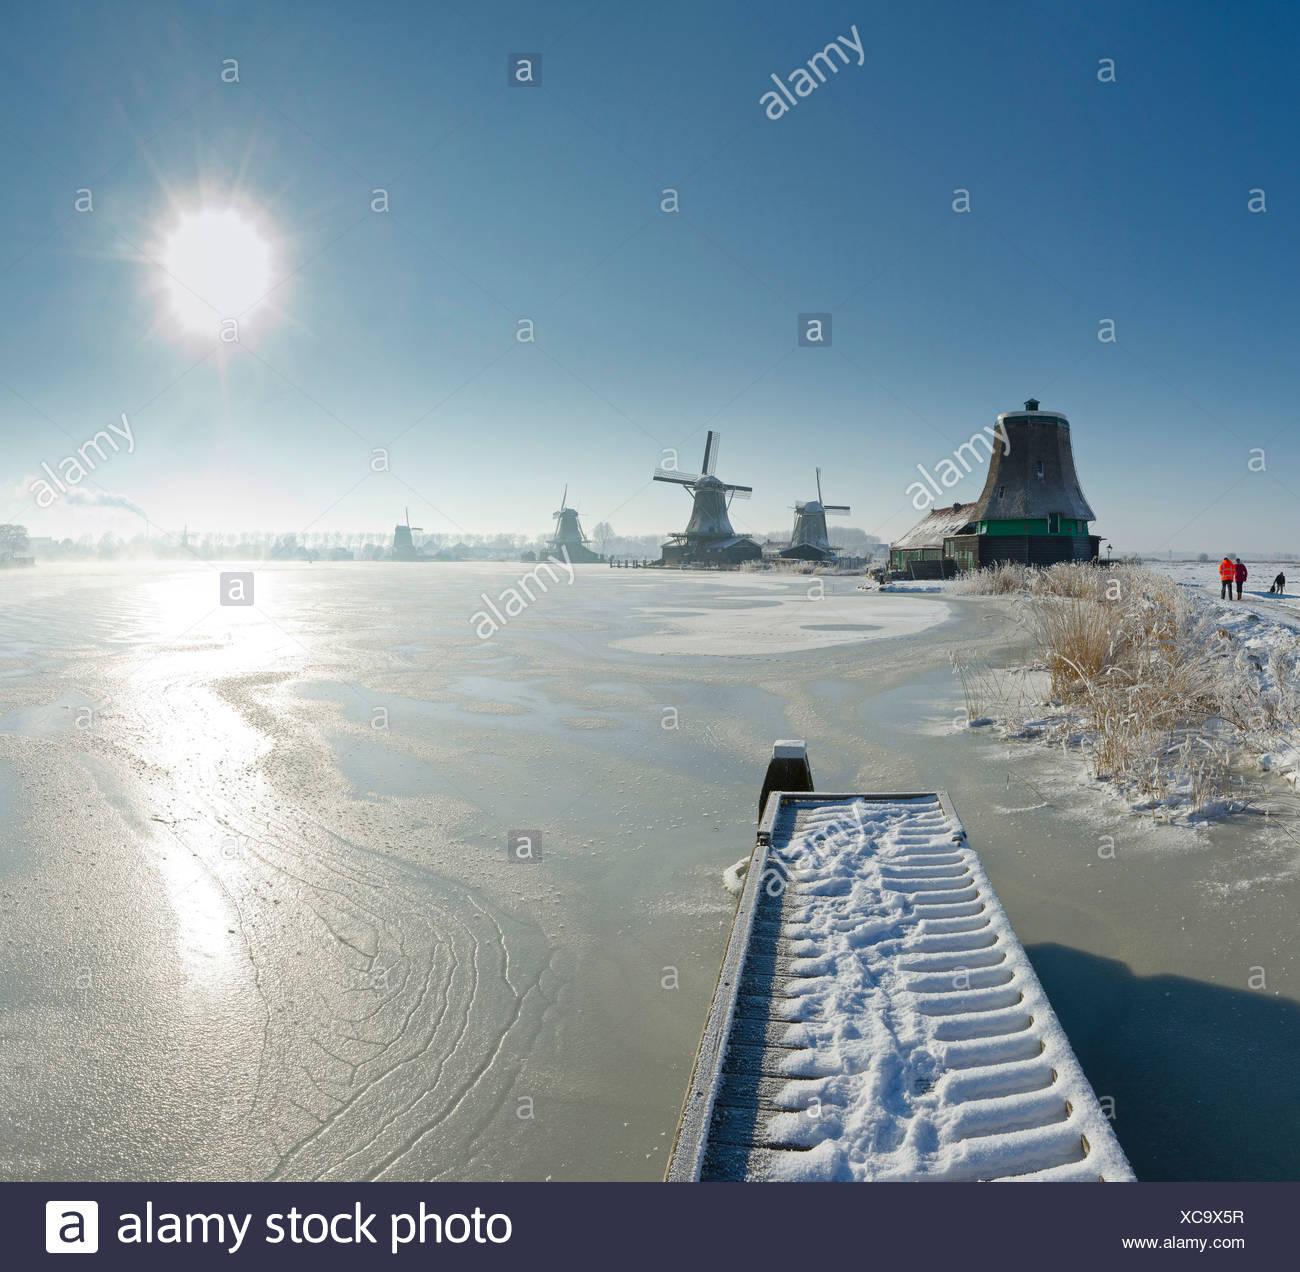 Netherlands, Holland, Europe, Zaandam, North Holland, windmill, water, winter, snow, ice, Windmills, frozen, river, Zaan - Stock Image